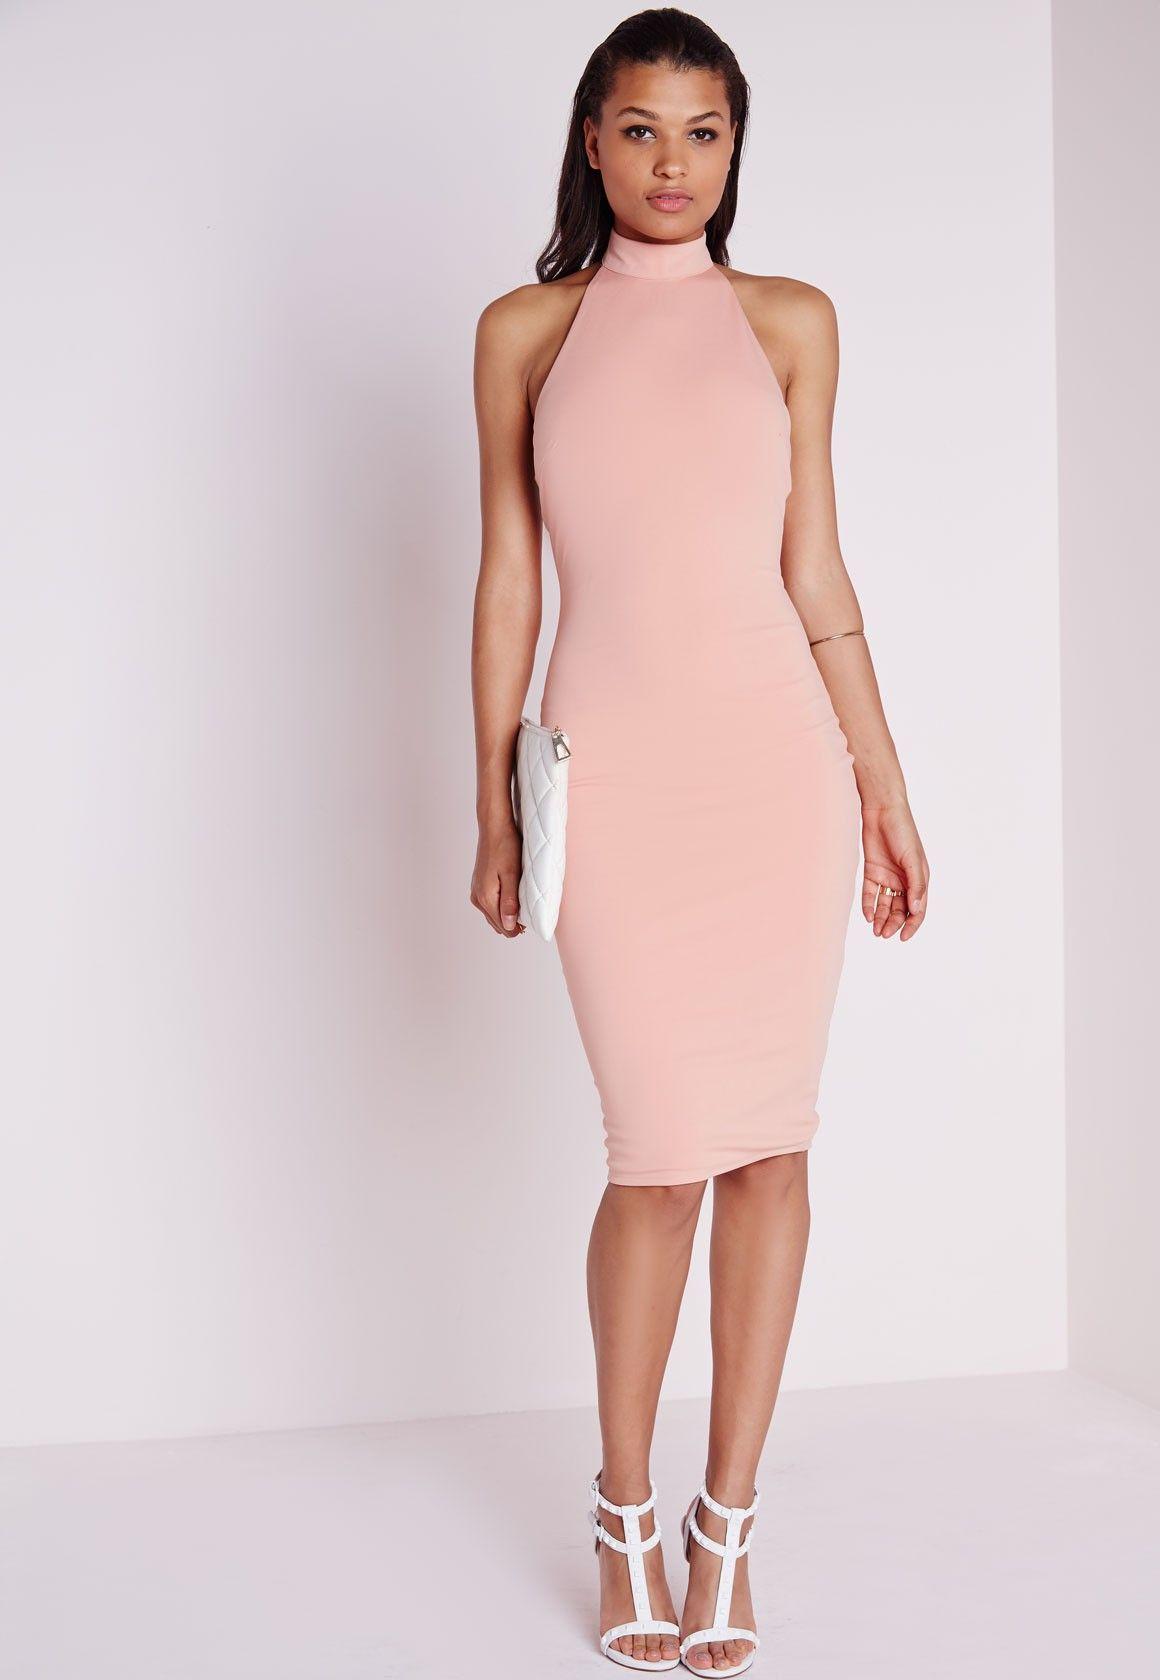 Missguided - Robe moulante rose à col montant   À acheter   Robe ... acc26d4a7275